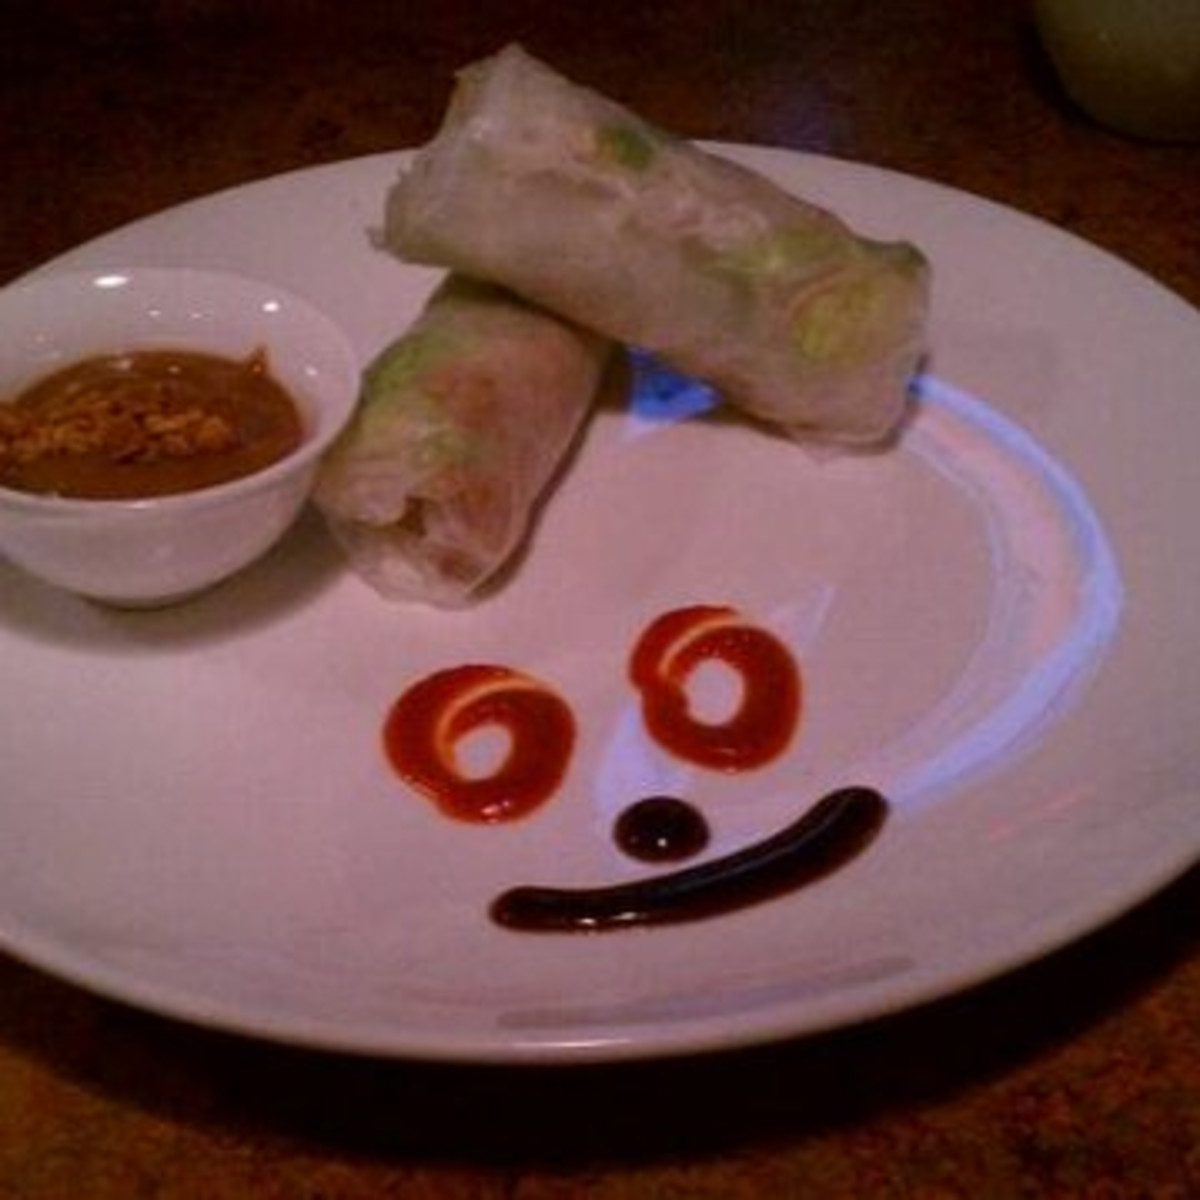 Austin photo: Food_888_PanAsian_Cuisine